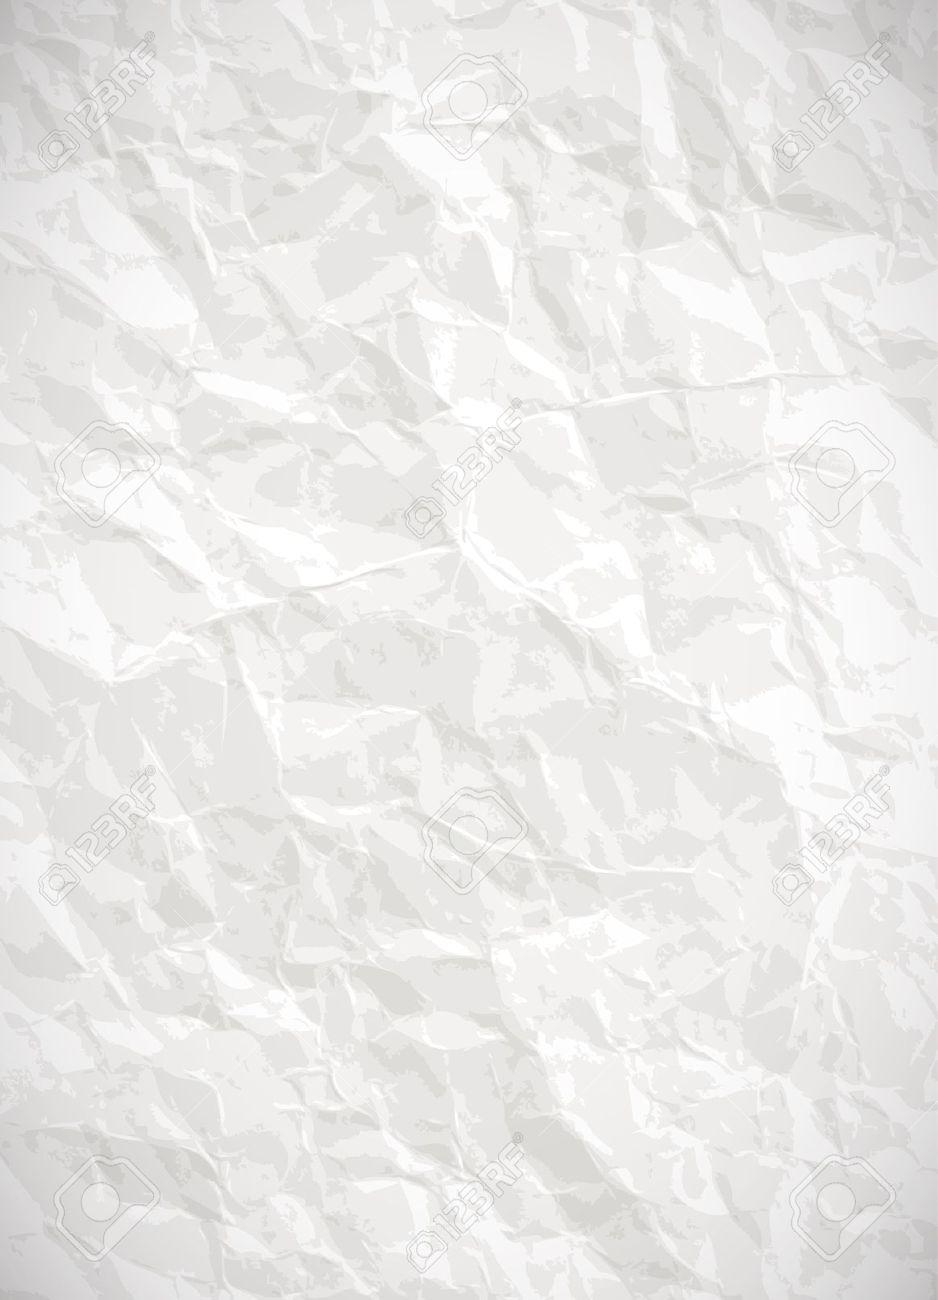 Paper texture clipart #10